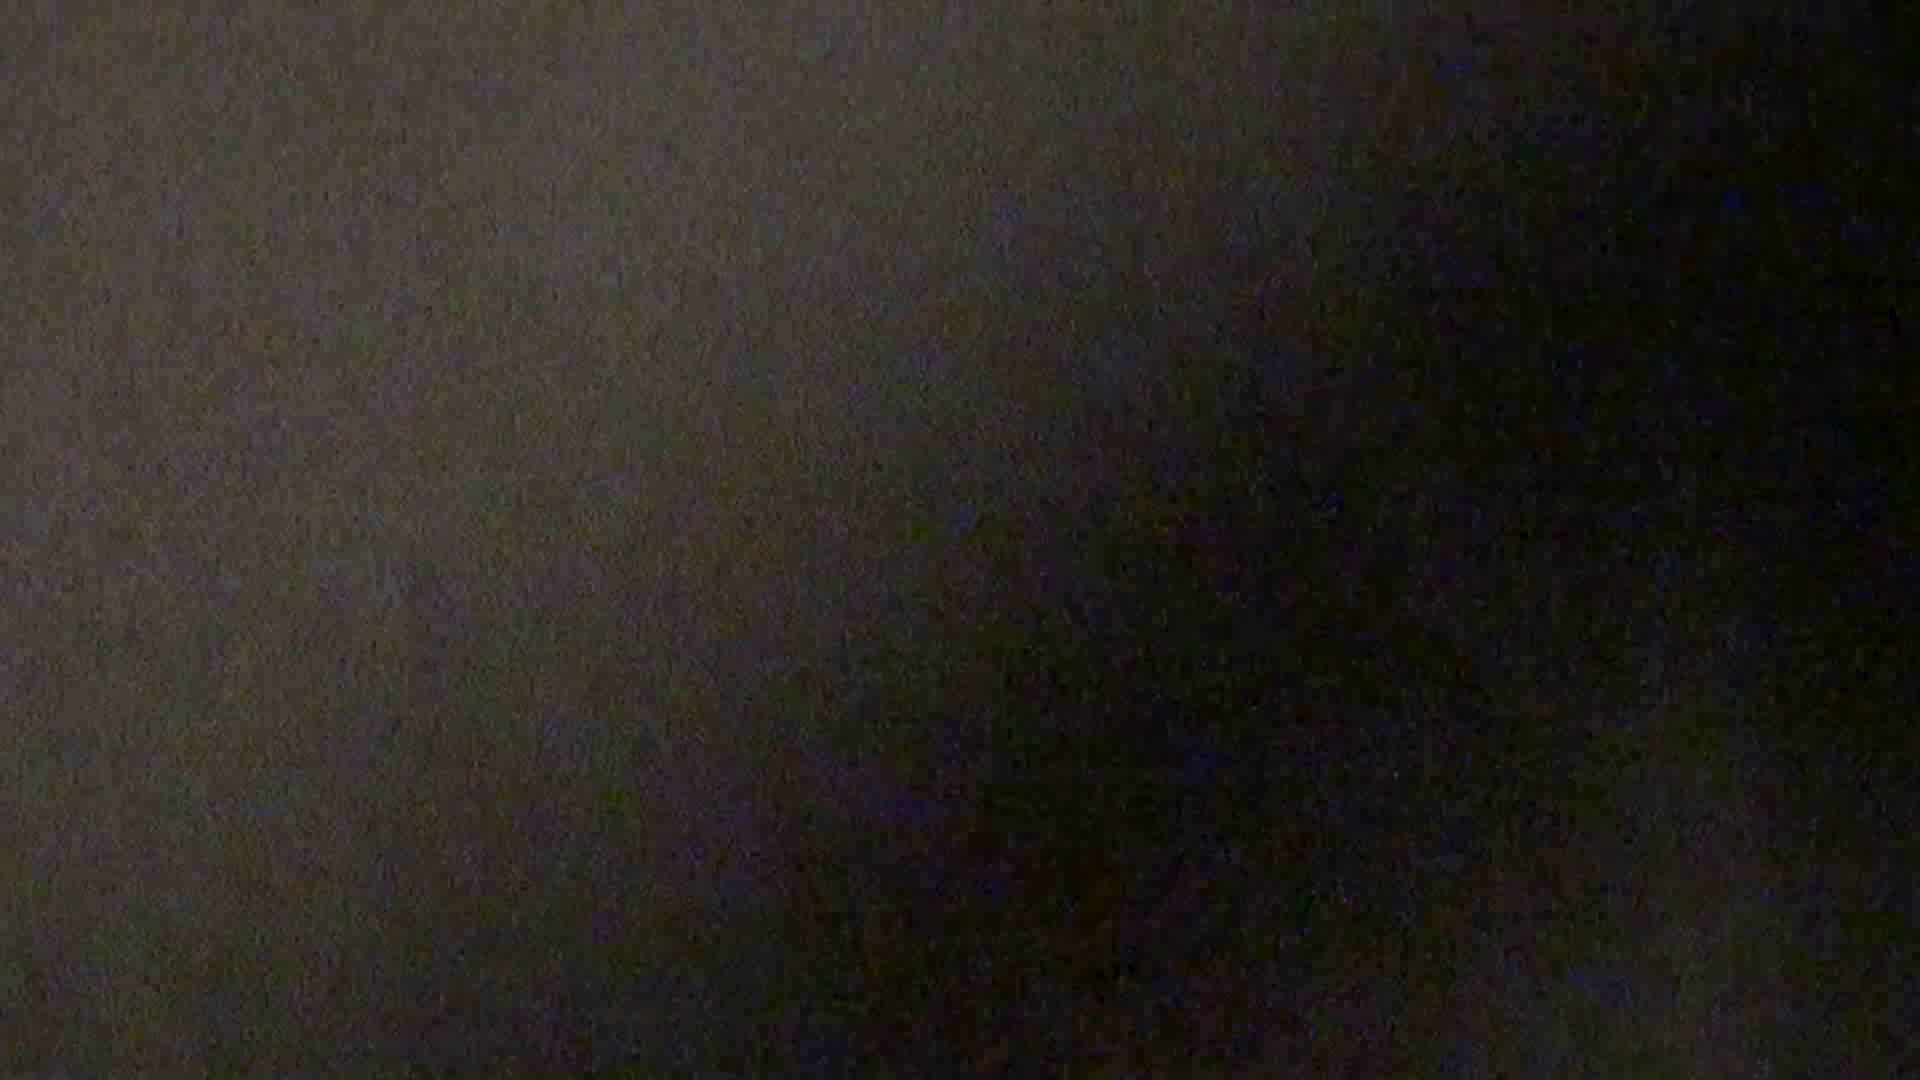 Aquaな露天風呂Vol.392 HなOL のぞき動画キャプチャ 80pic 74